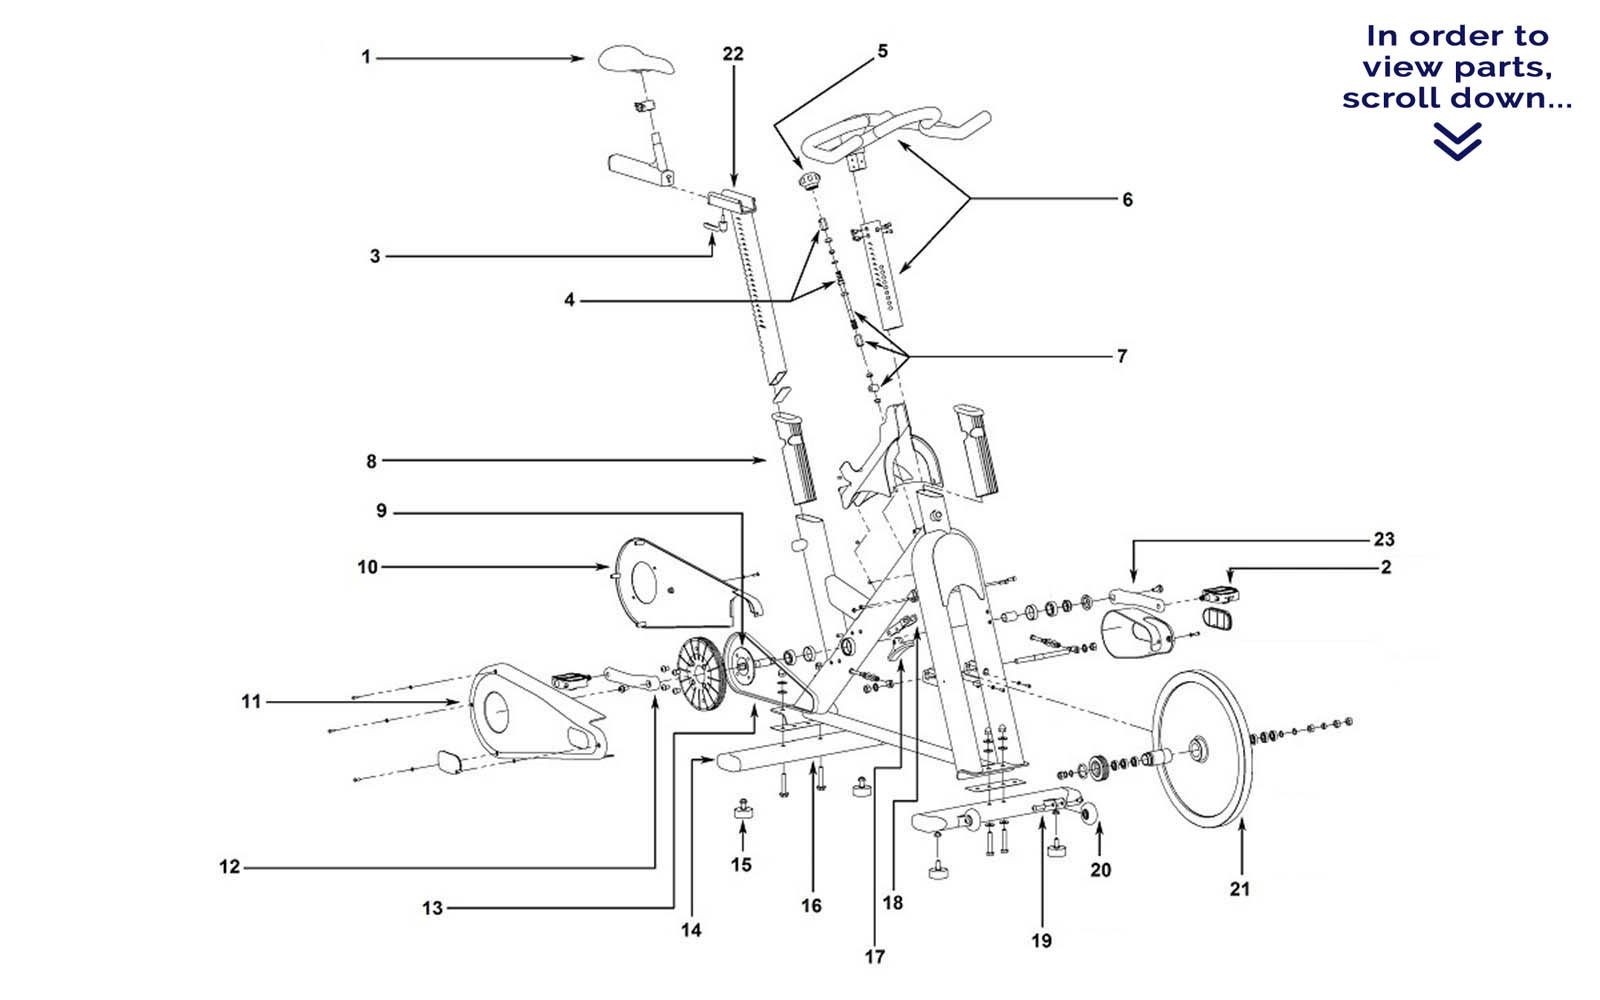 Matrix Tomahawk E-Series--Scroll down to view parts